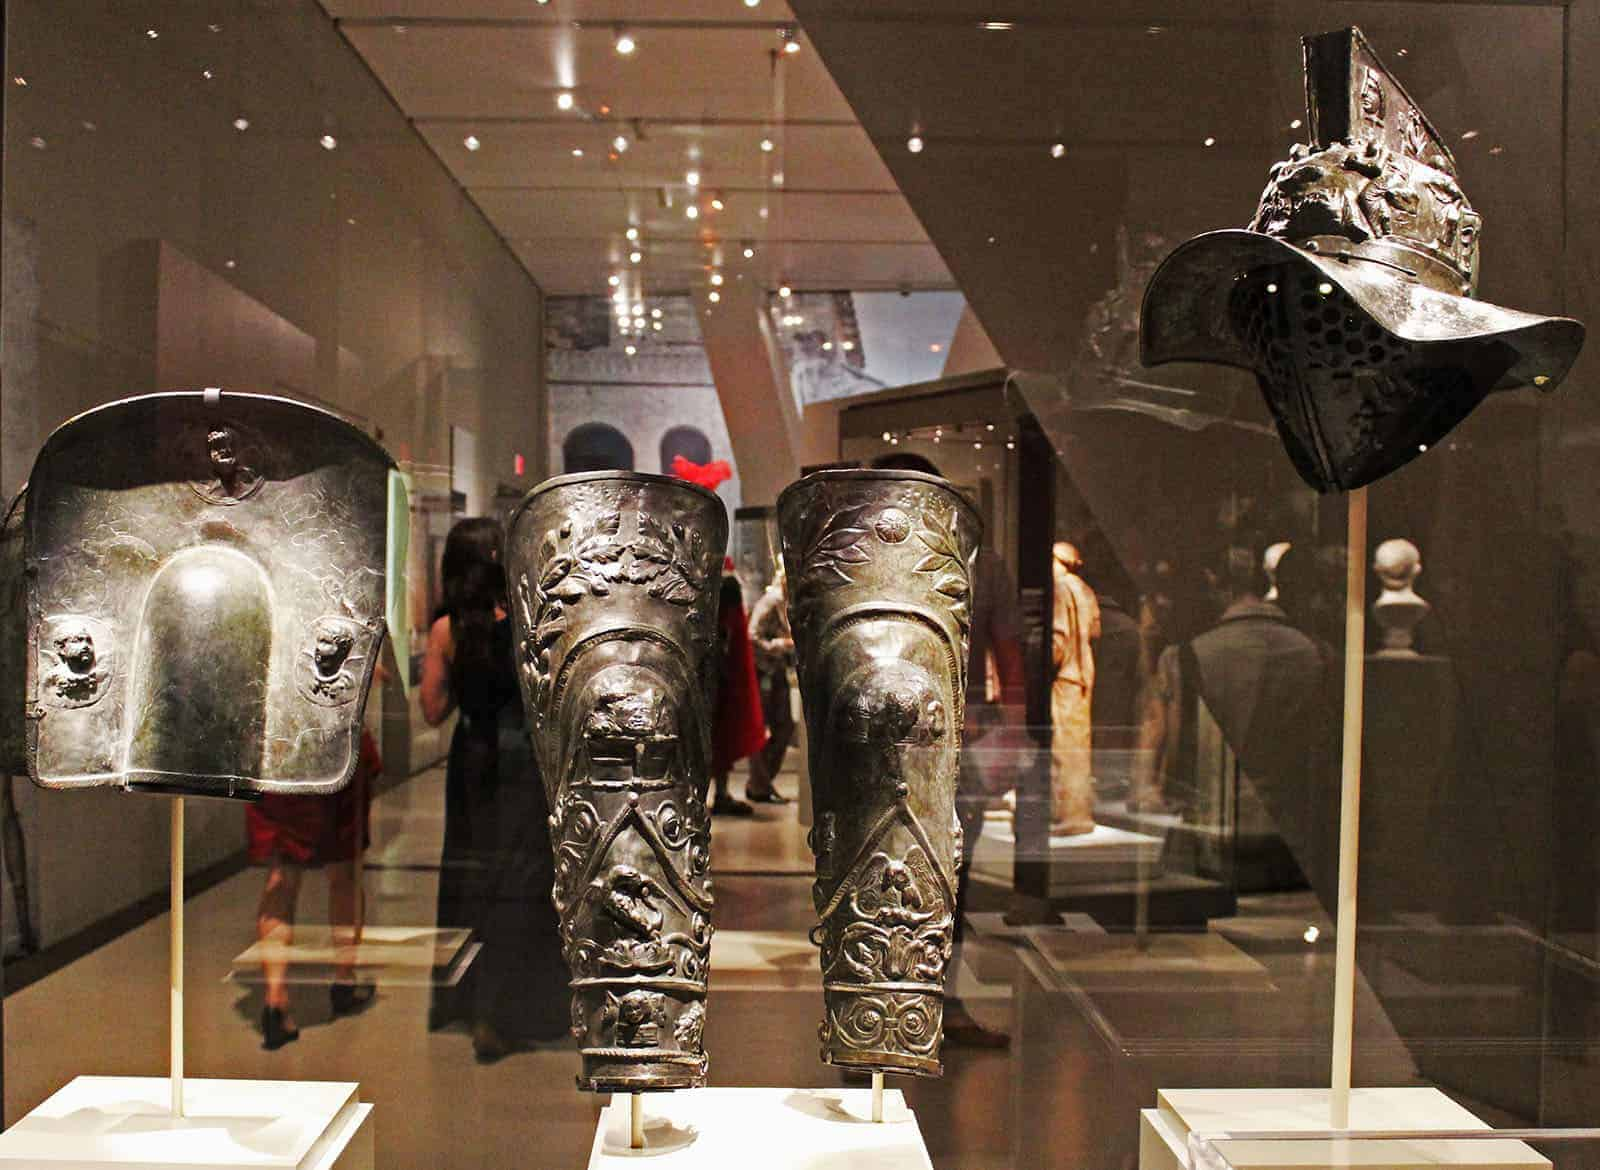 Pompeii Exhibit at the ROM in Toronto